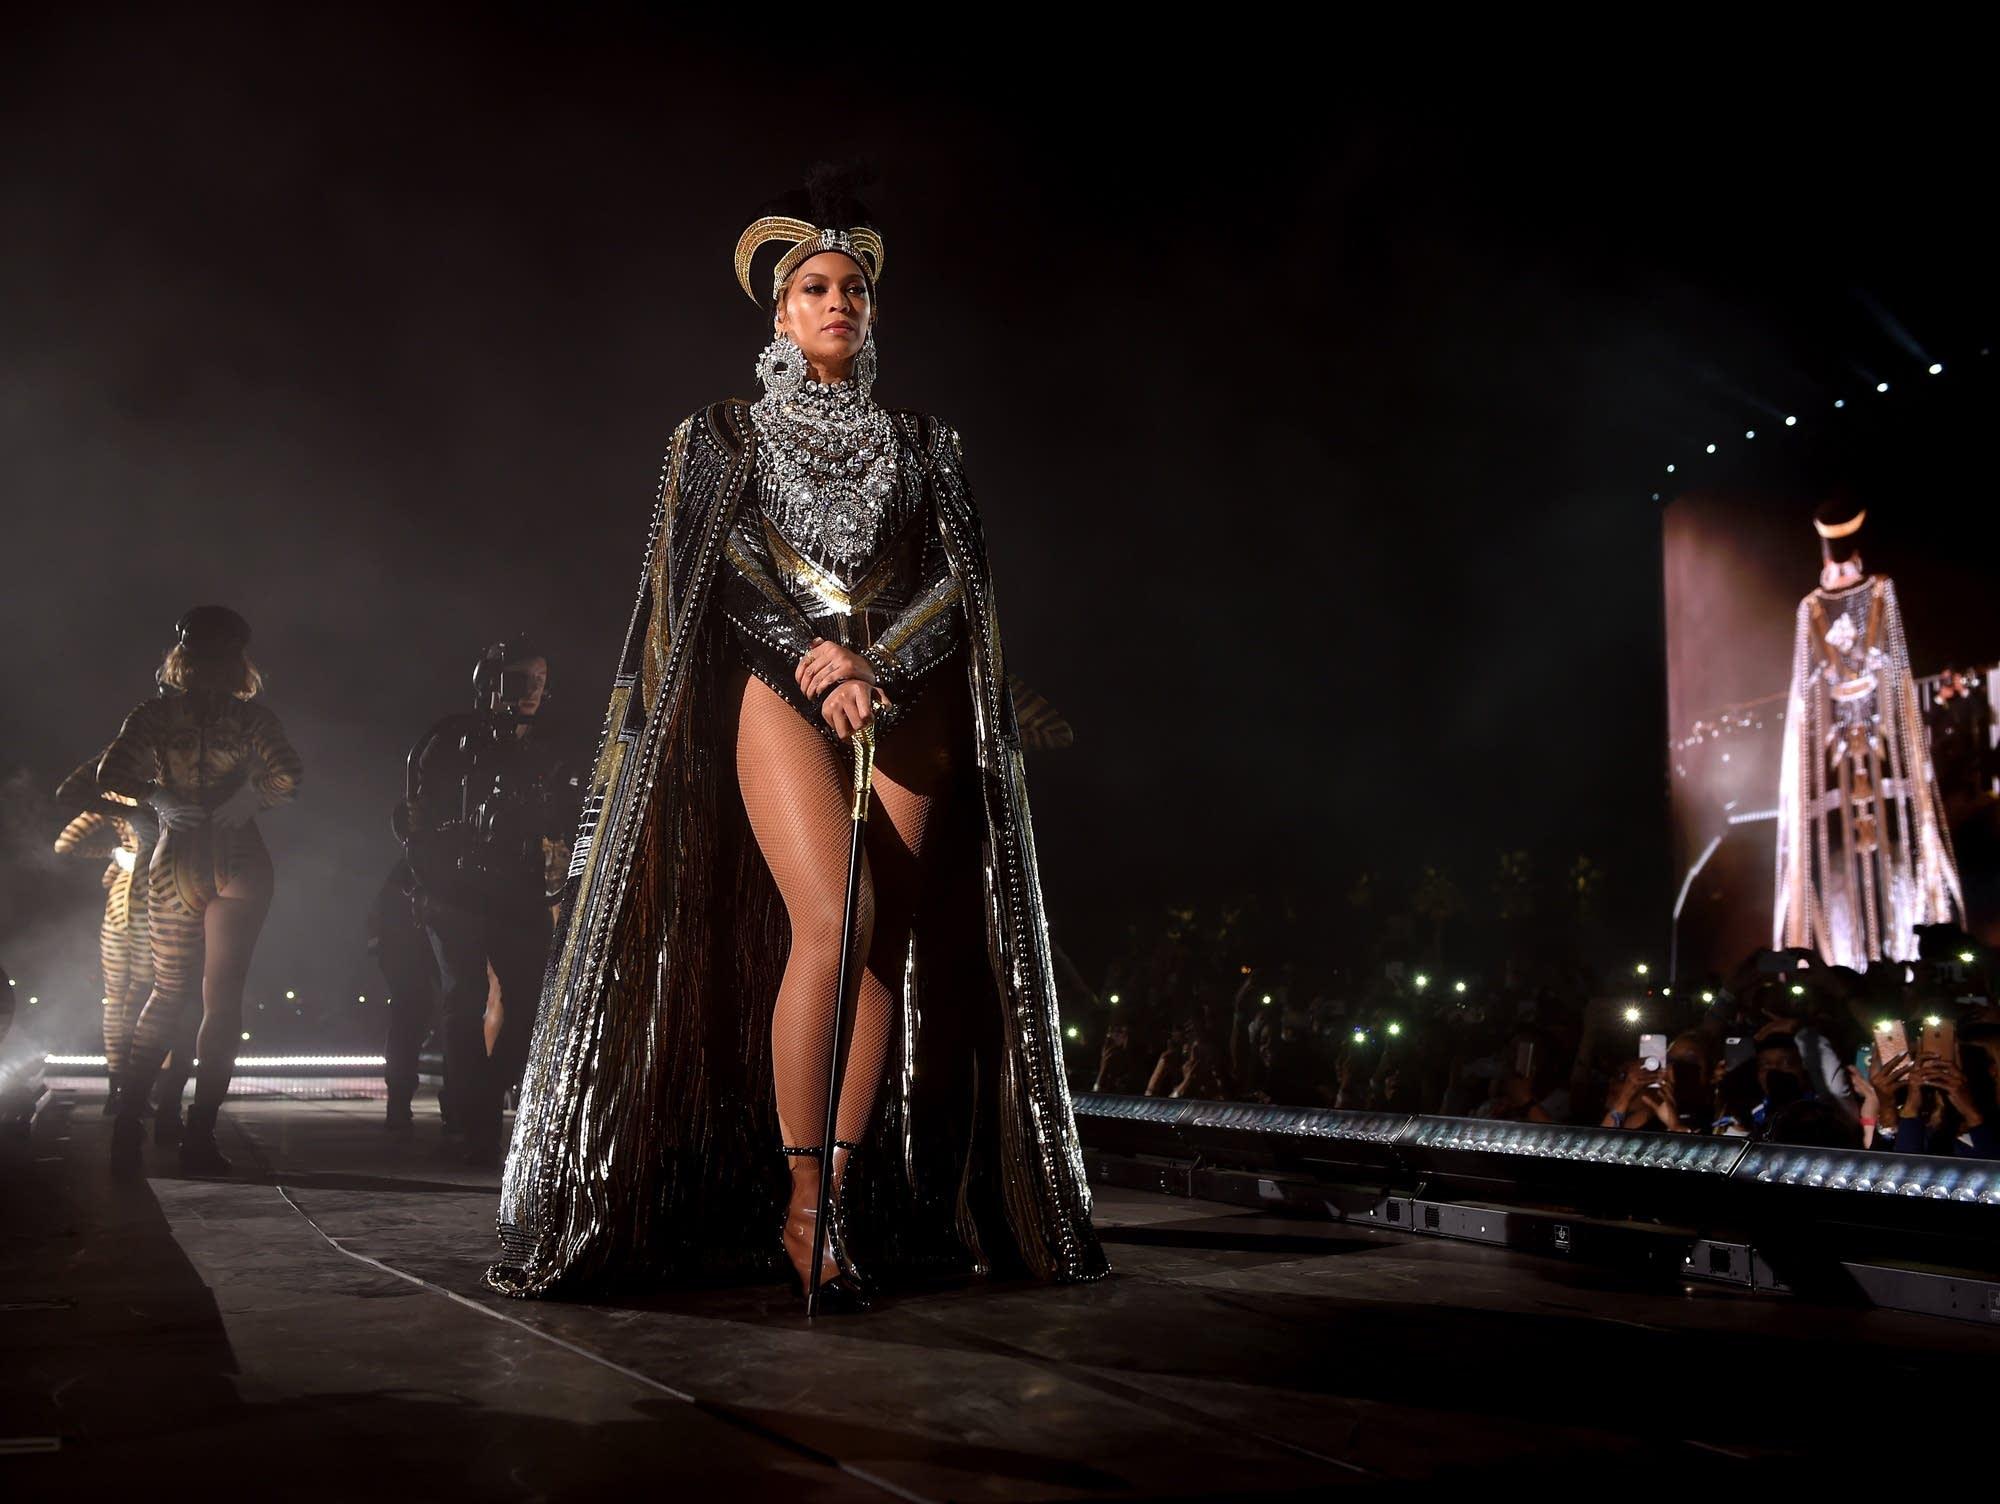 Beyonce performs at Coachella, 2018.